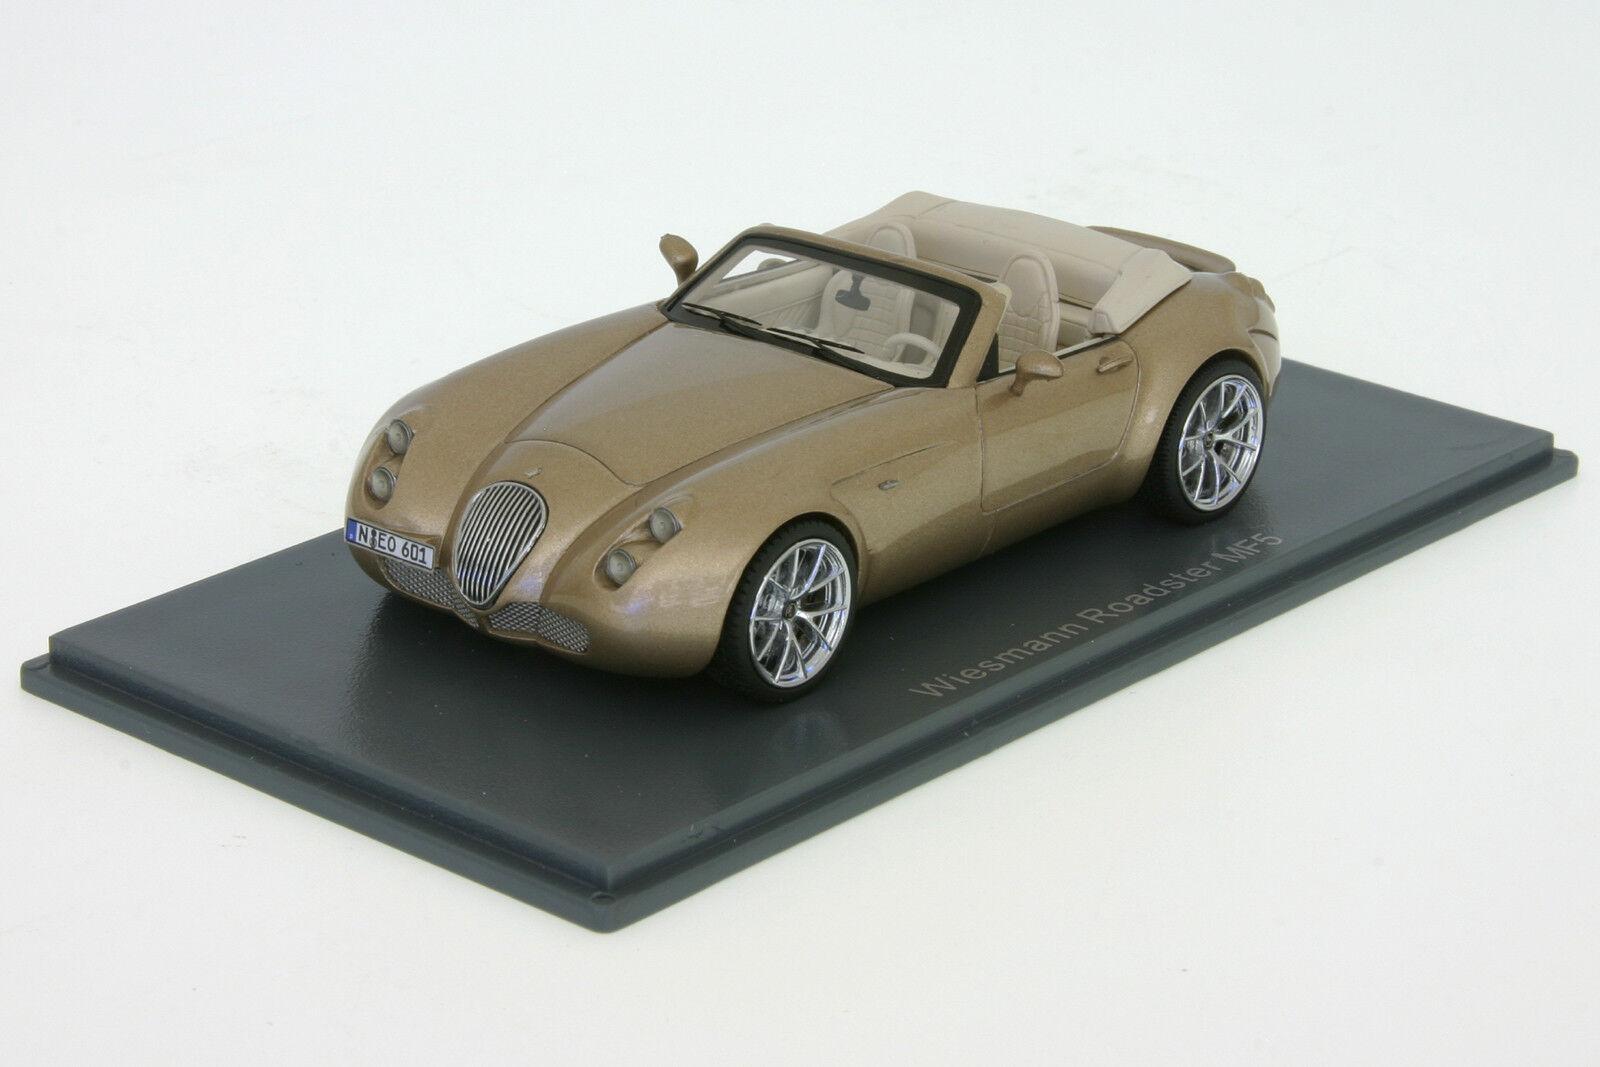 Wiesmann Roadster MF5  2010 gold metallic  1 43 Neo Scale Models 44601  NEU OVP